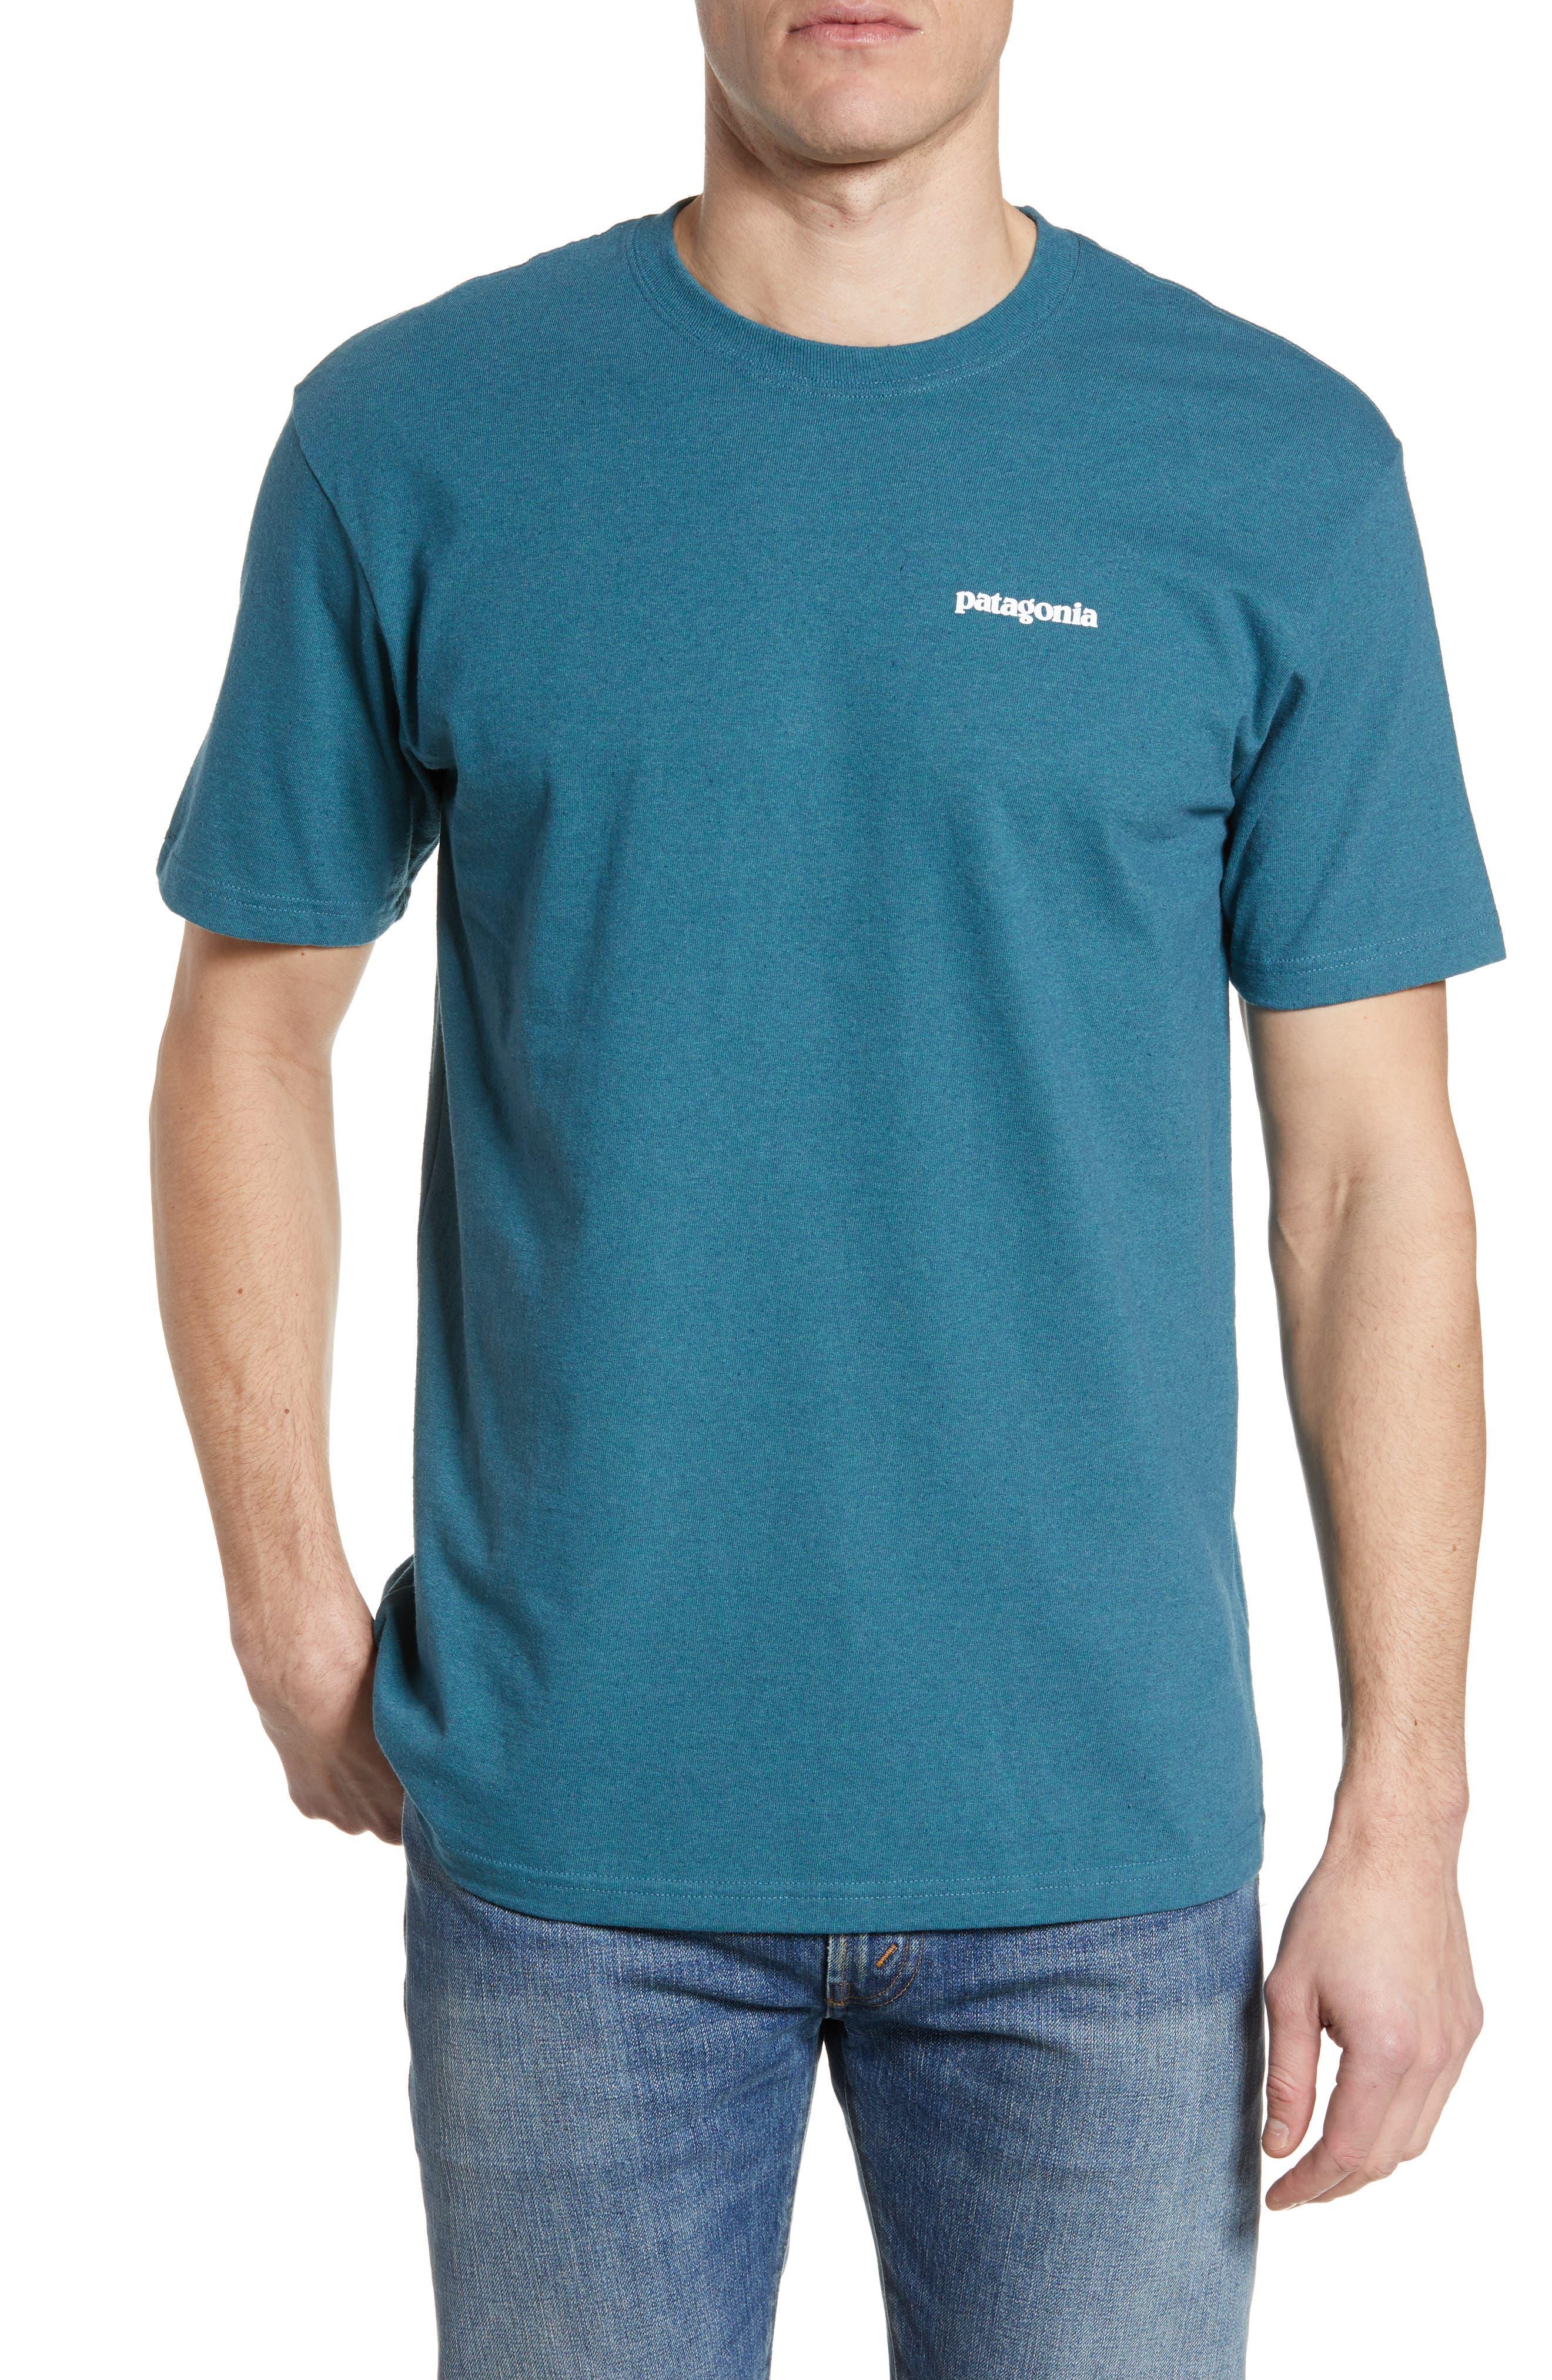 Patagonia Responsibili-Tee T-Shirt, Blue/green